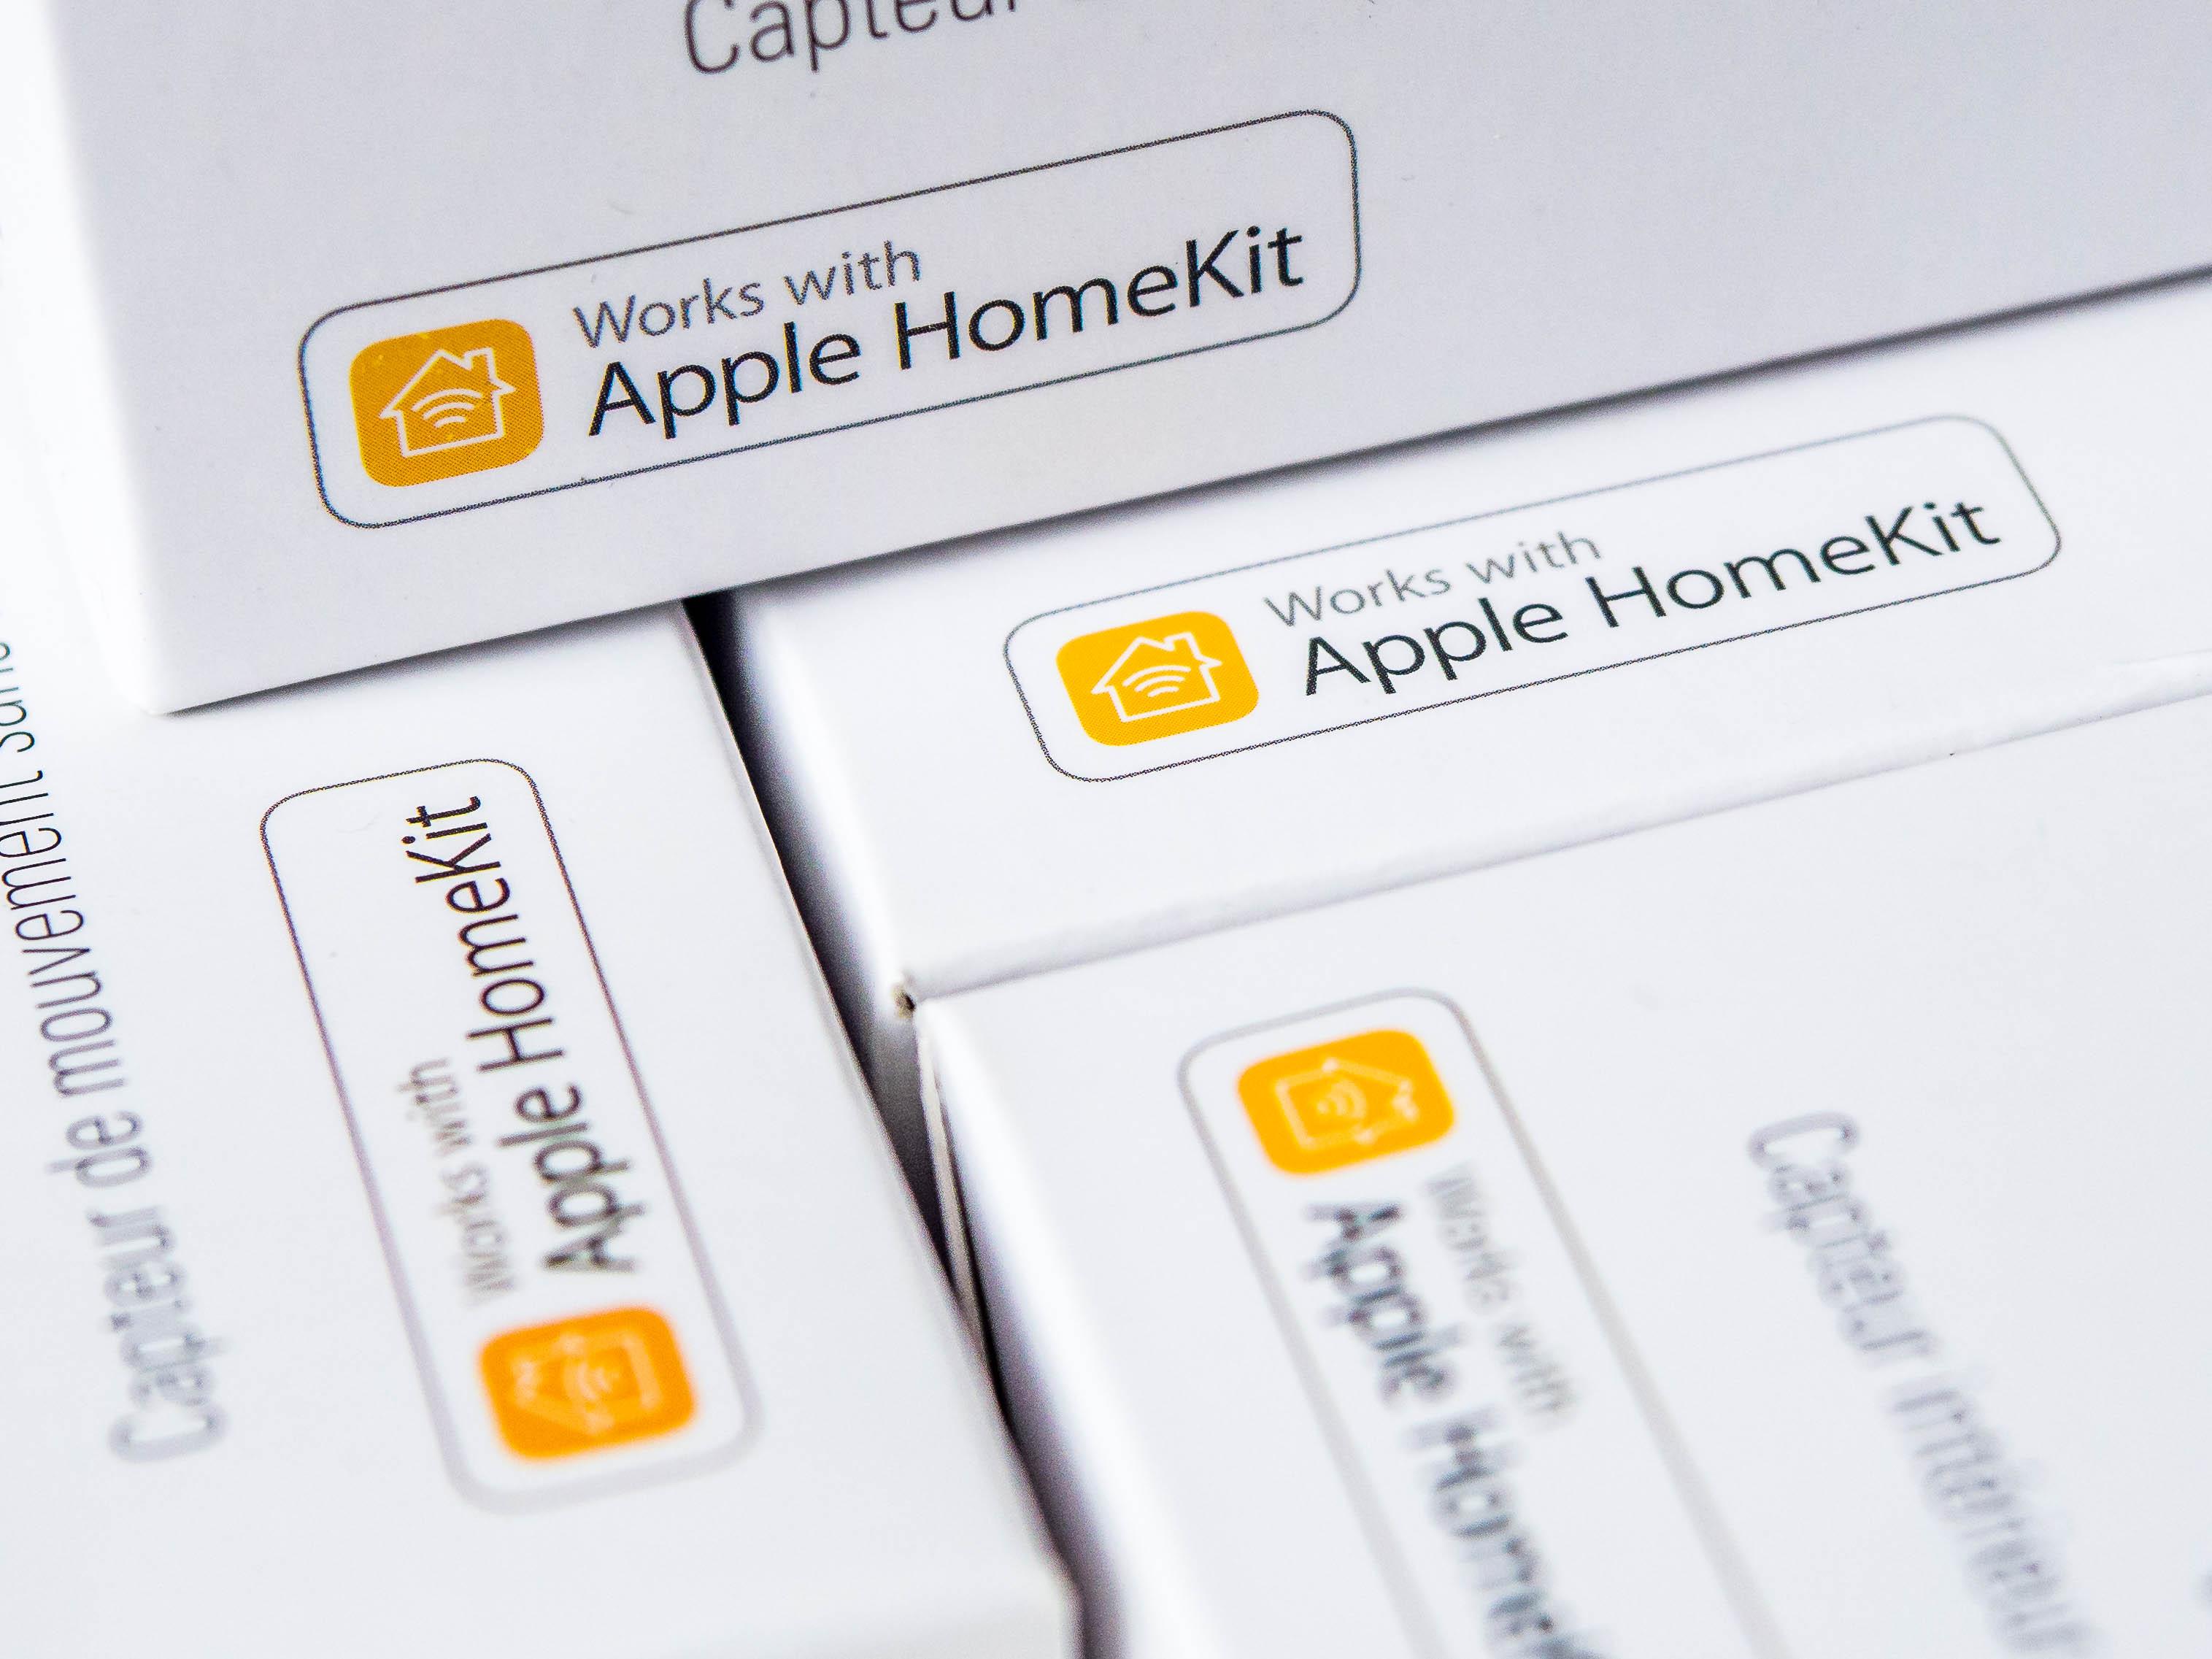 apple homekit erkl rt so steuerst du das smart home mit. Black Bedroom Furniture Sets. Home Design Ideas